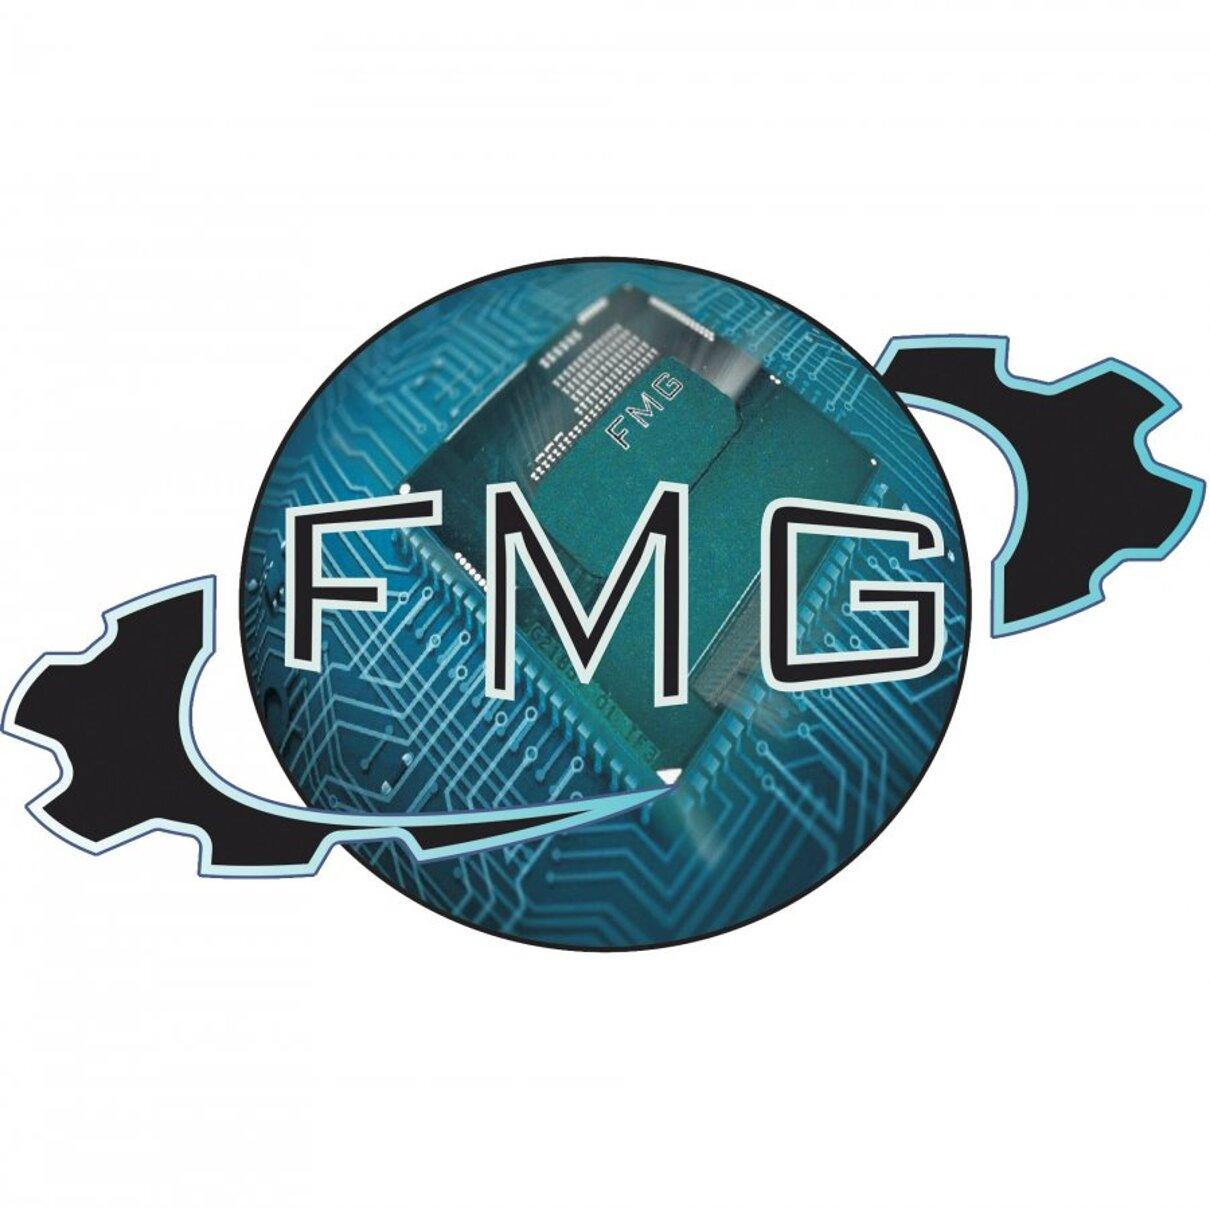 Жалоба-отзыв: Эф Эм групп (FMG) - Обман.  Фото №1